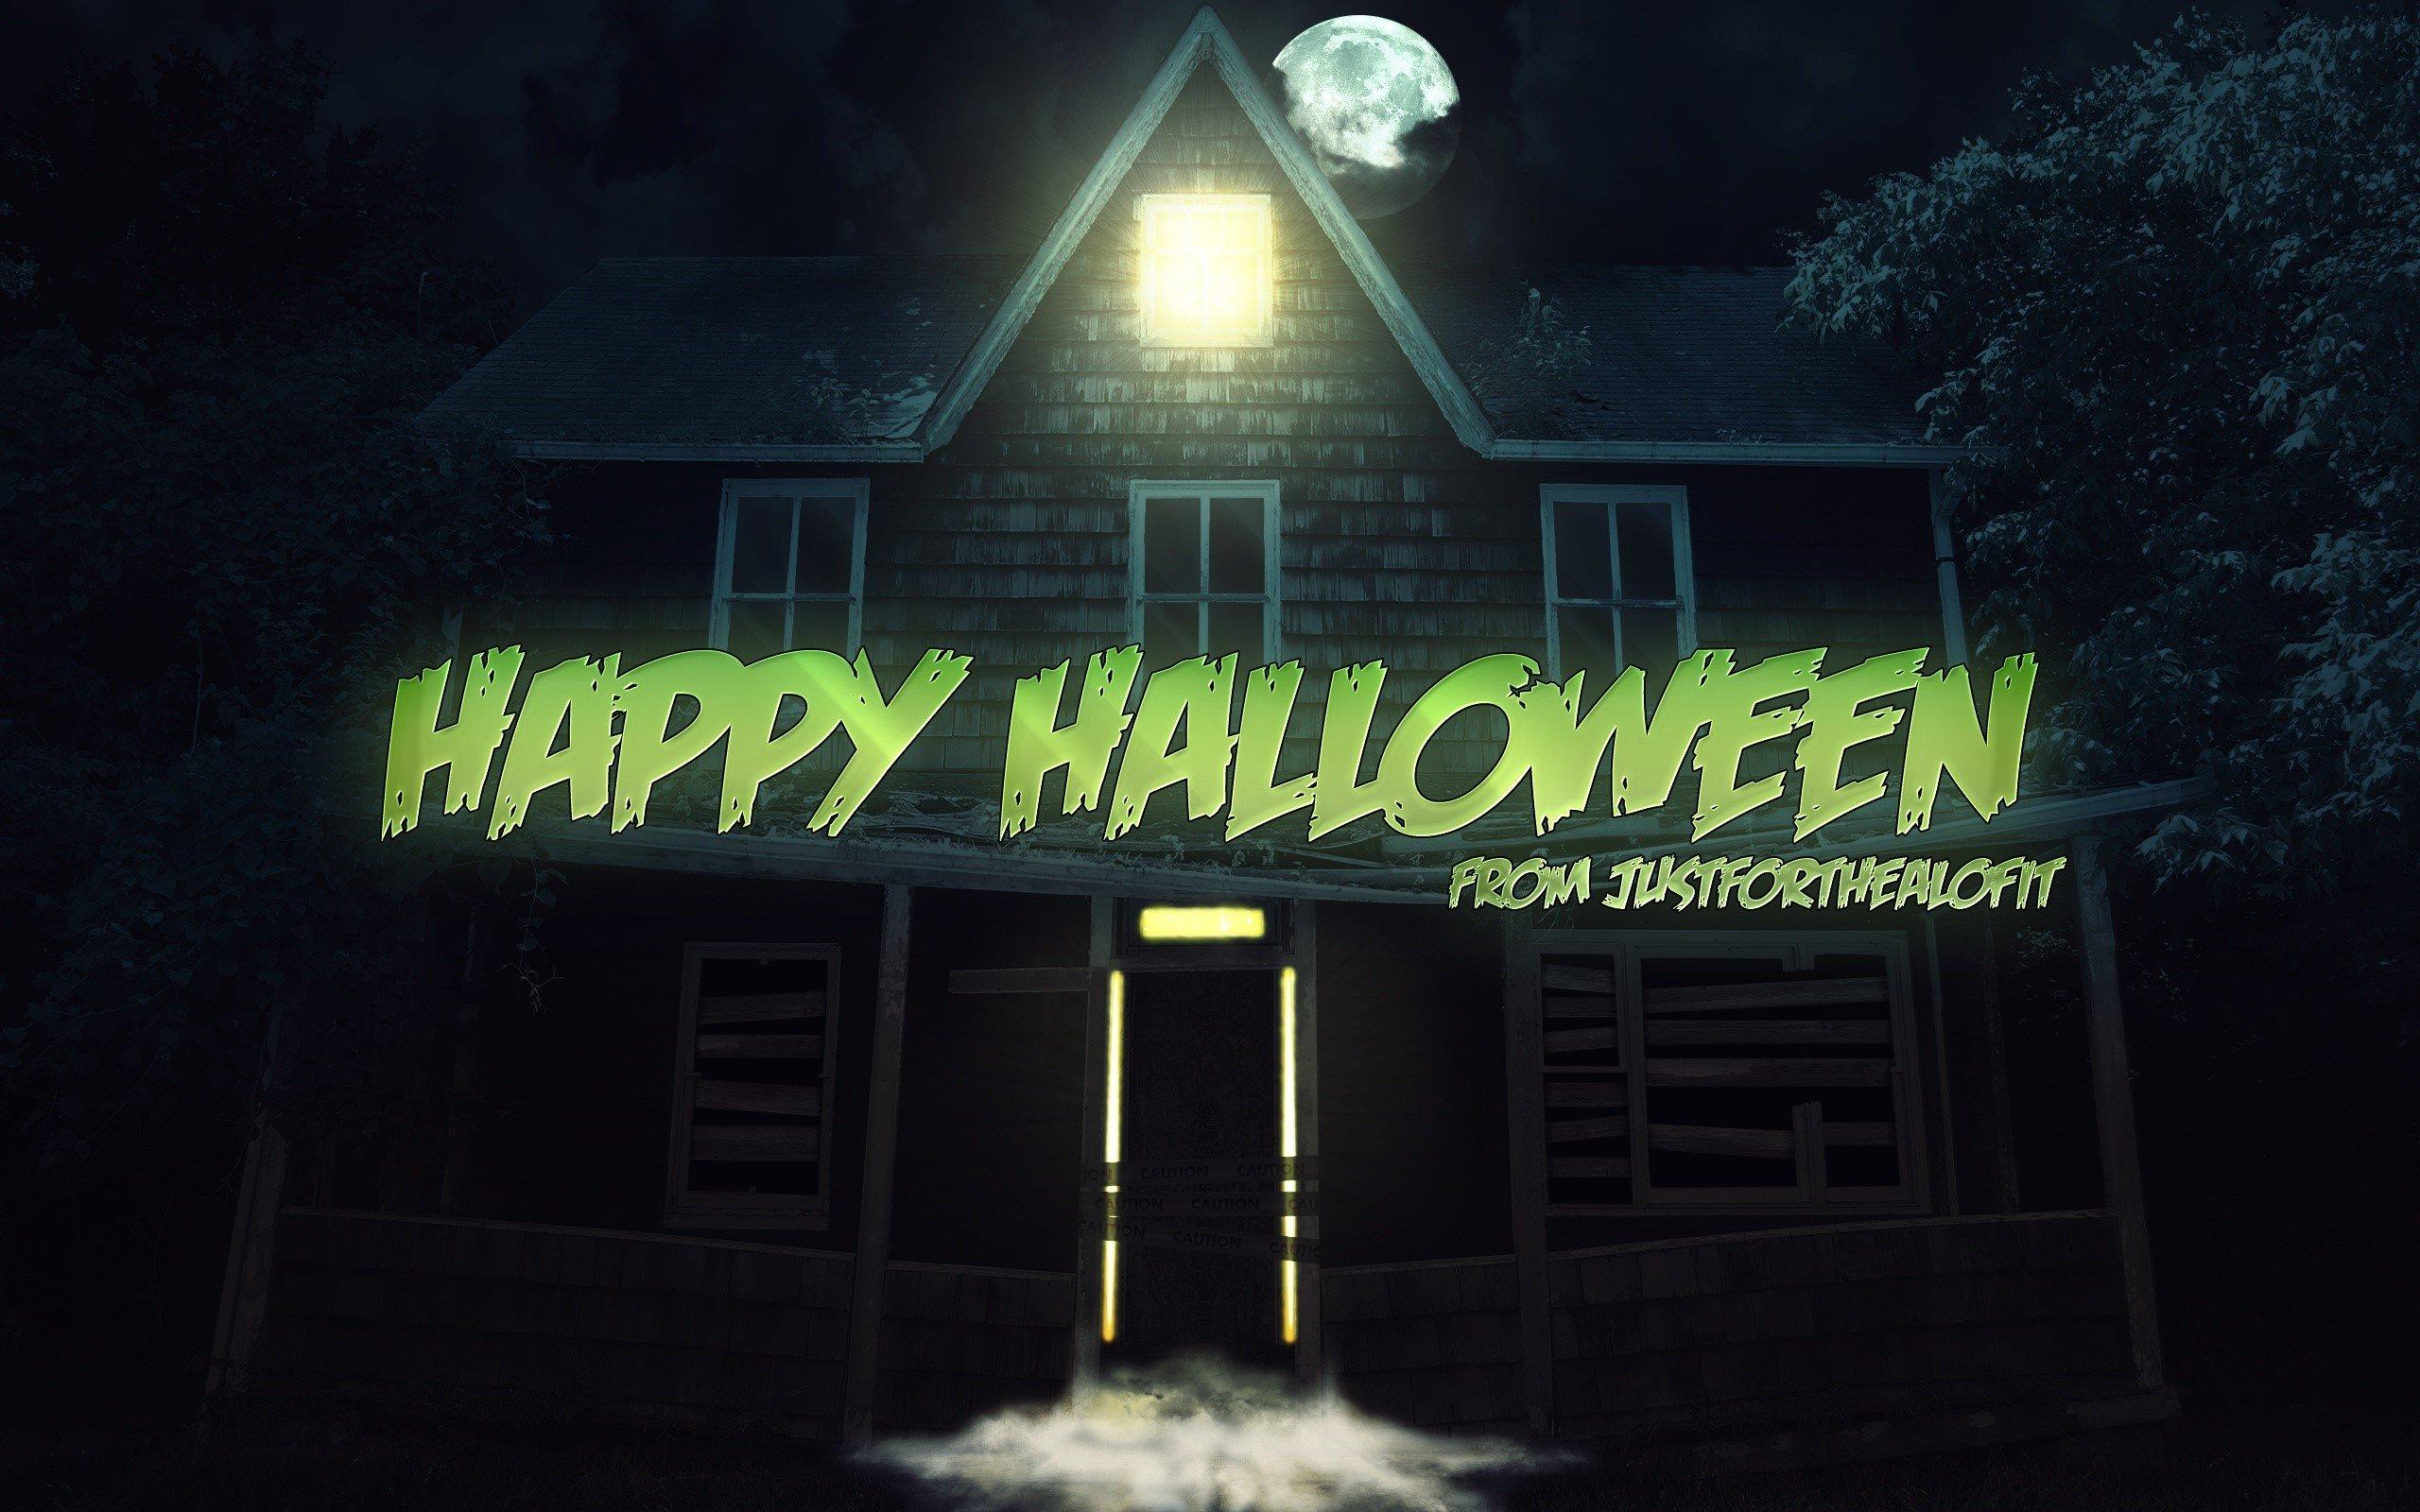 Wallpaper Haunted house